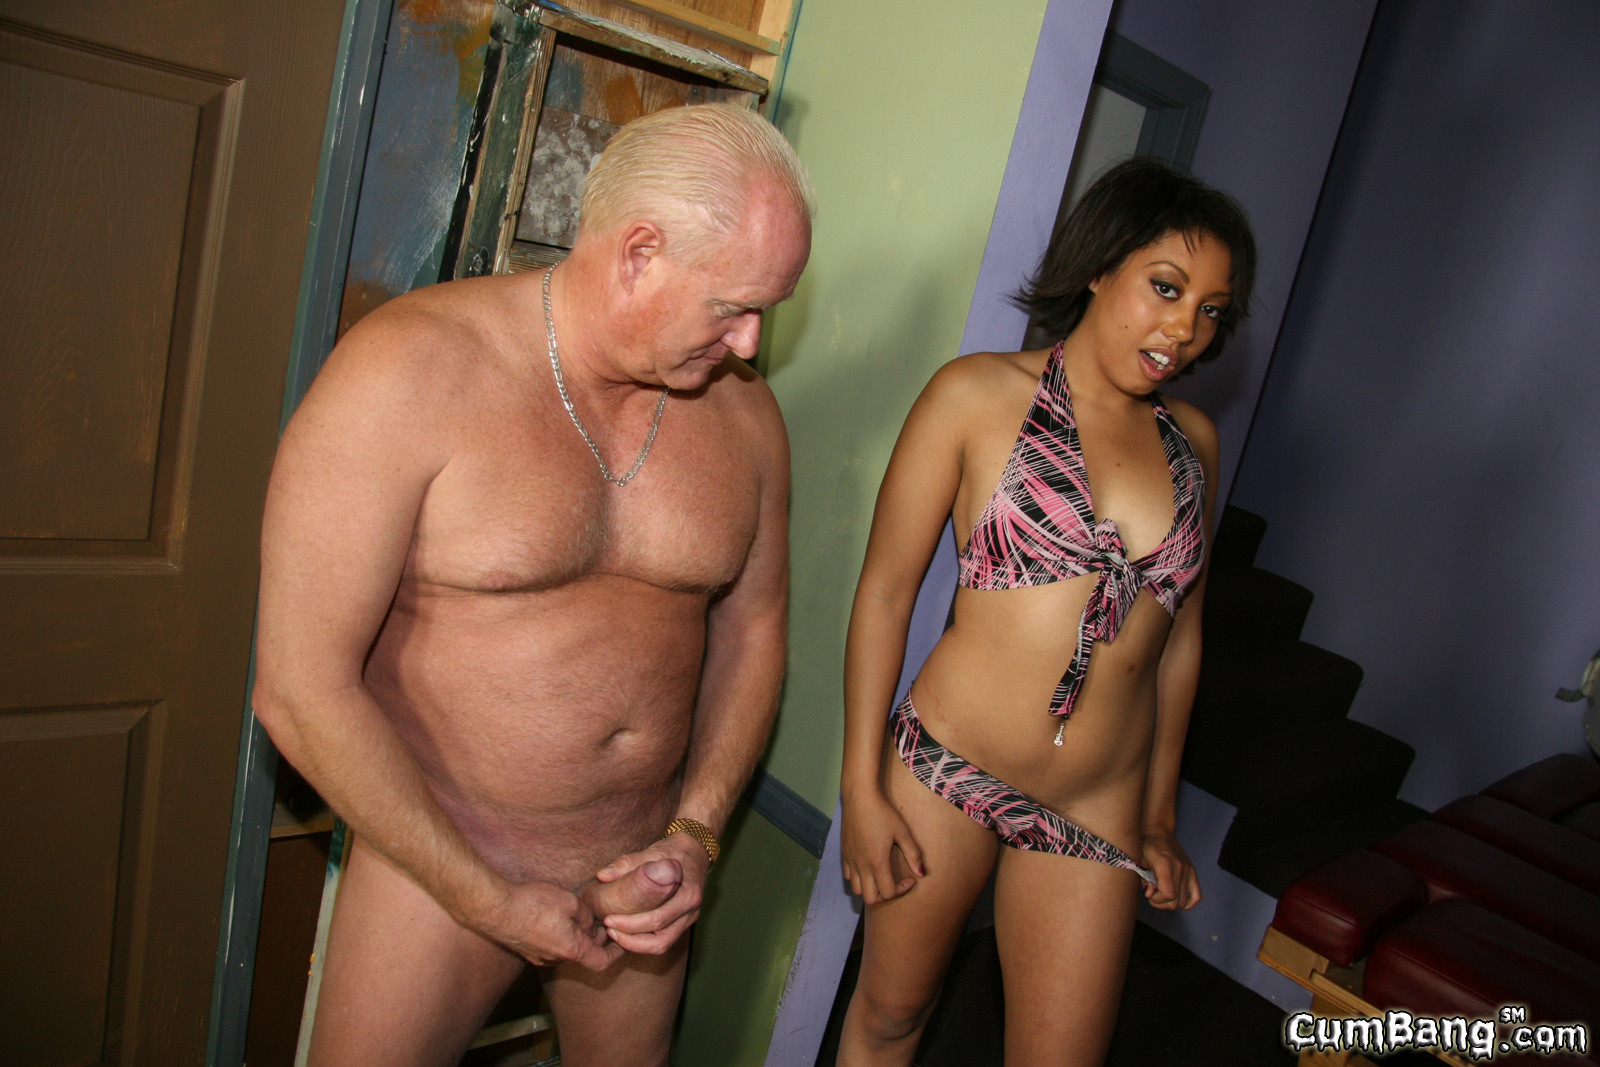 G heel high in nude string woman